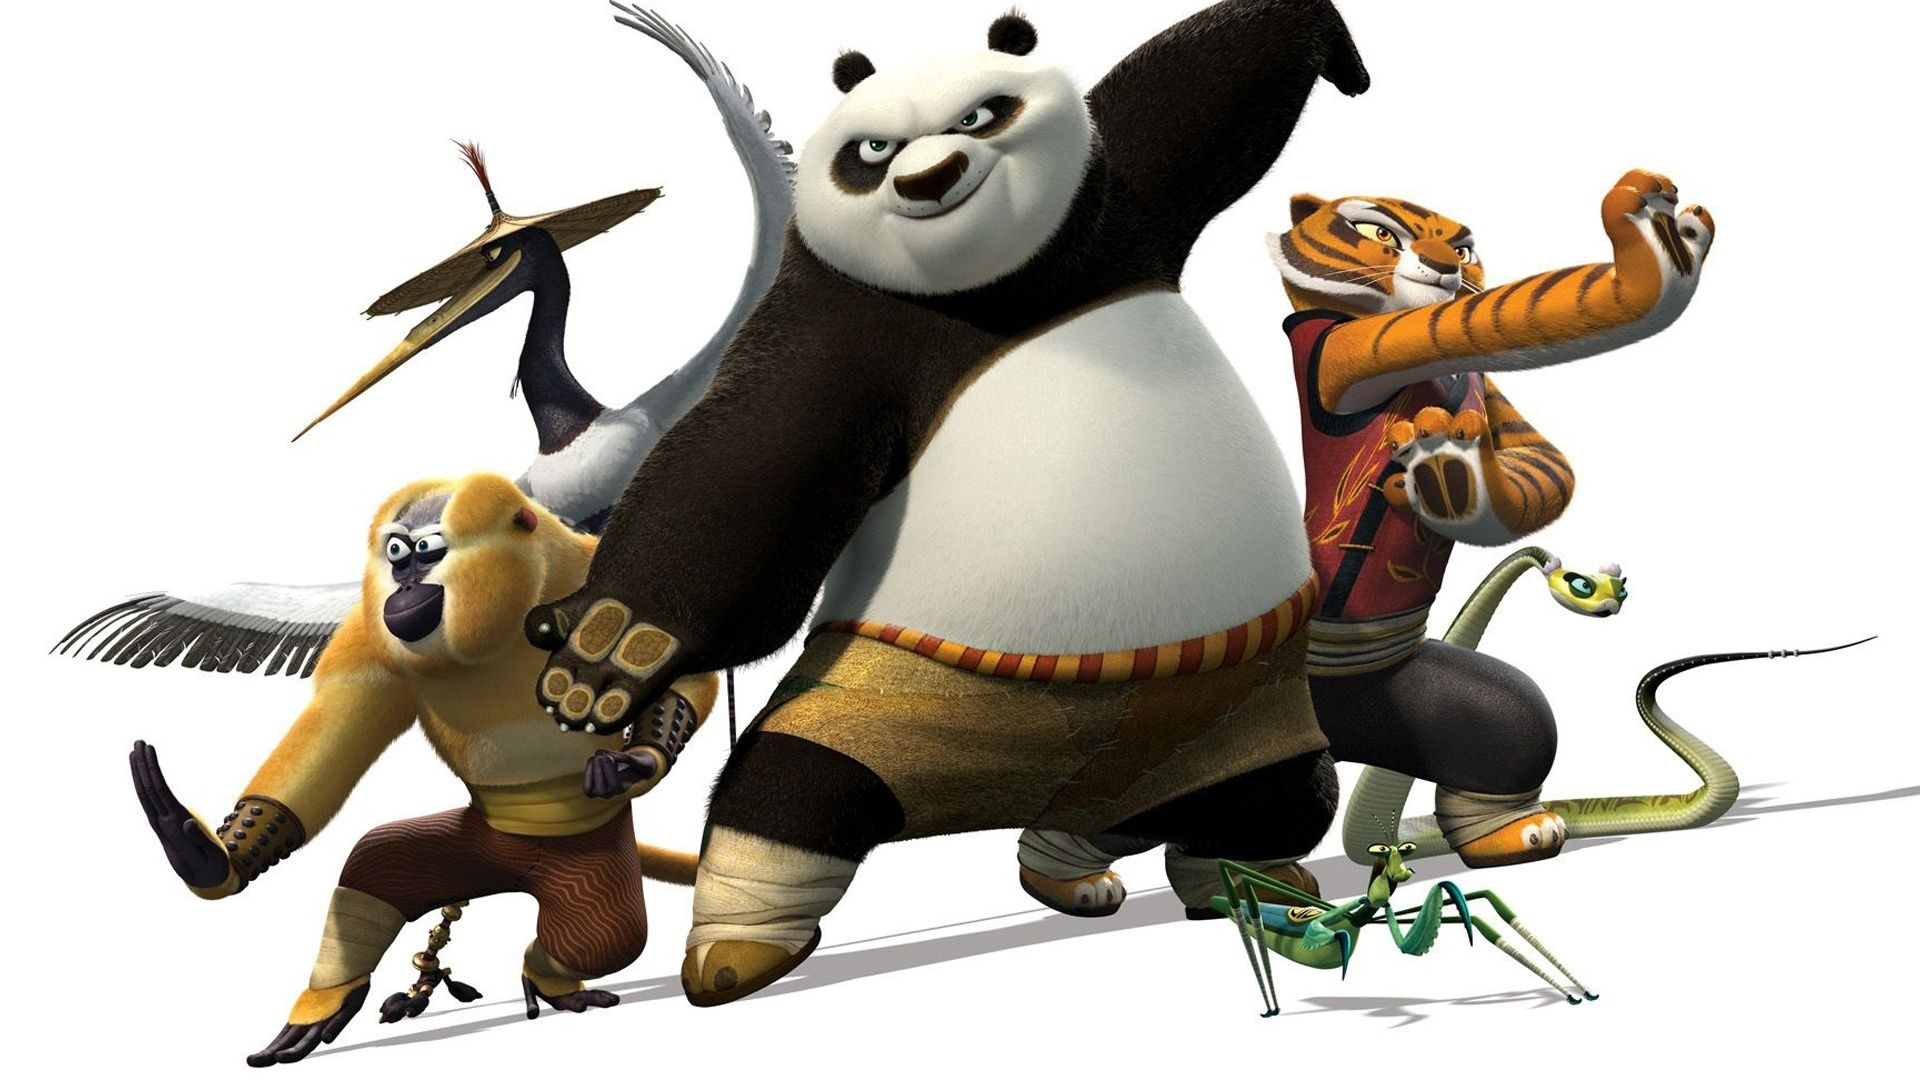 kung fu panda tigress - google search | pose reference | pinterest